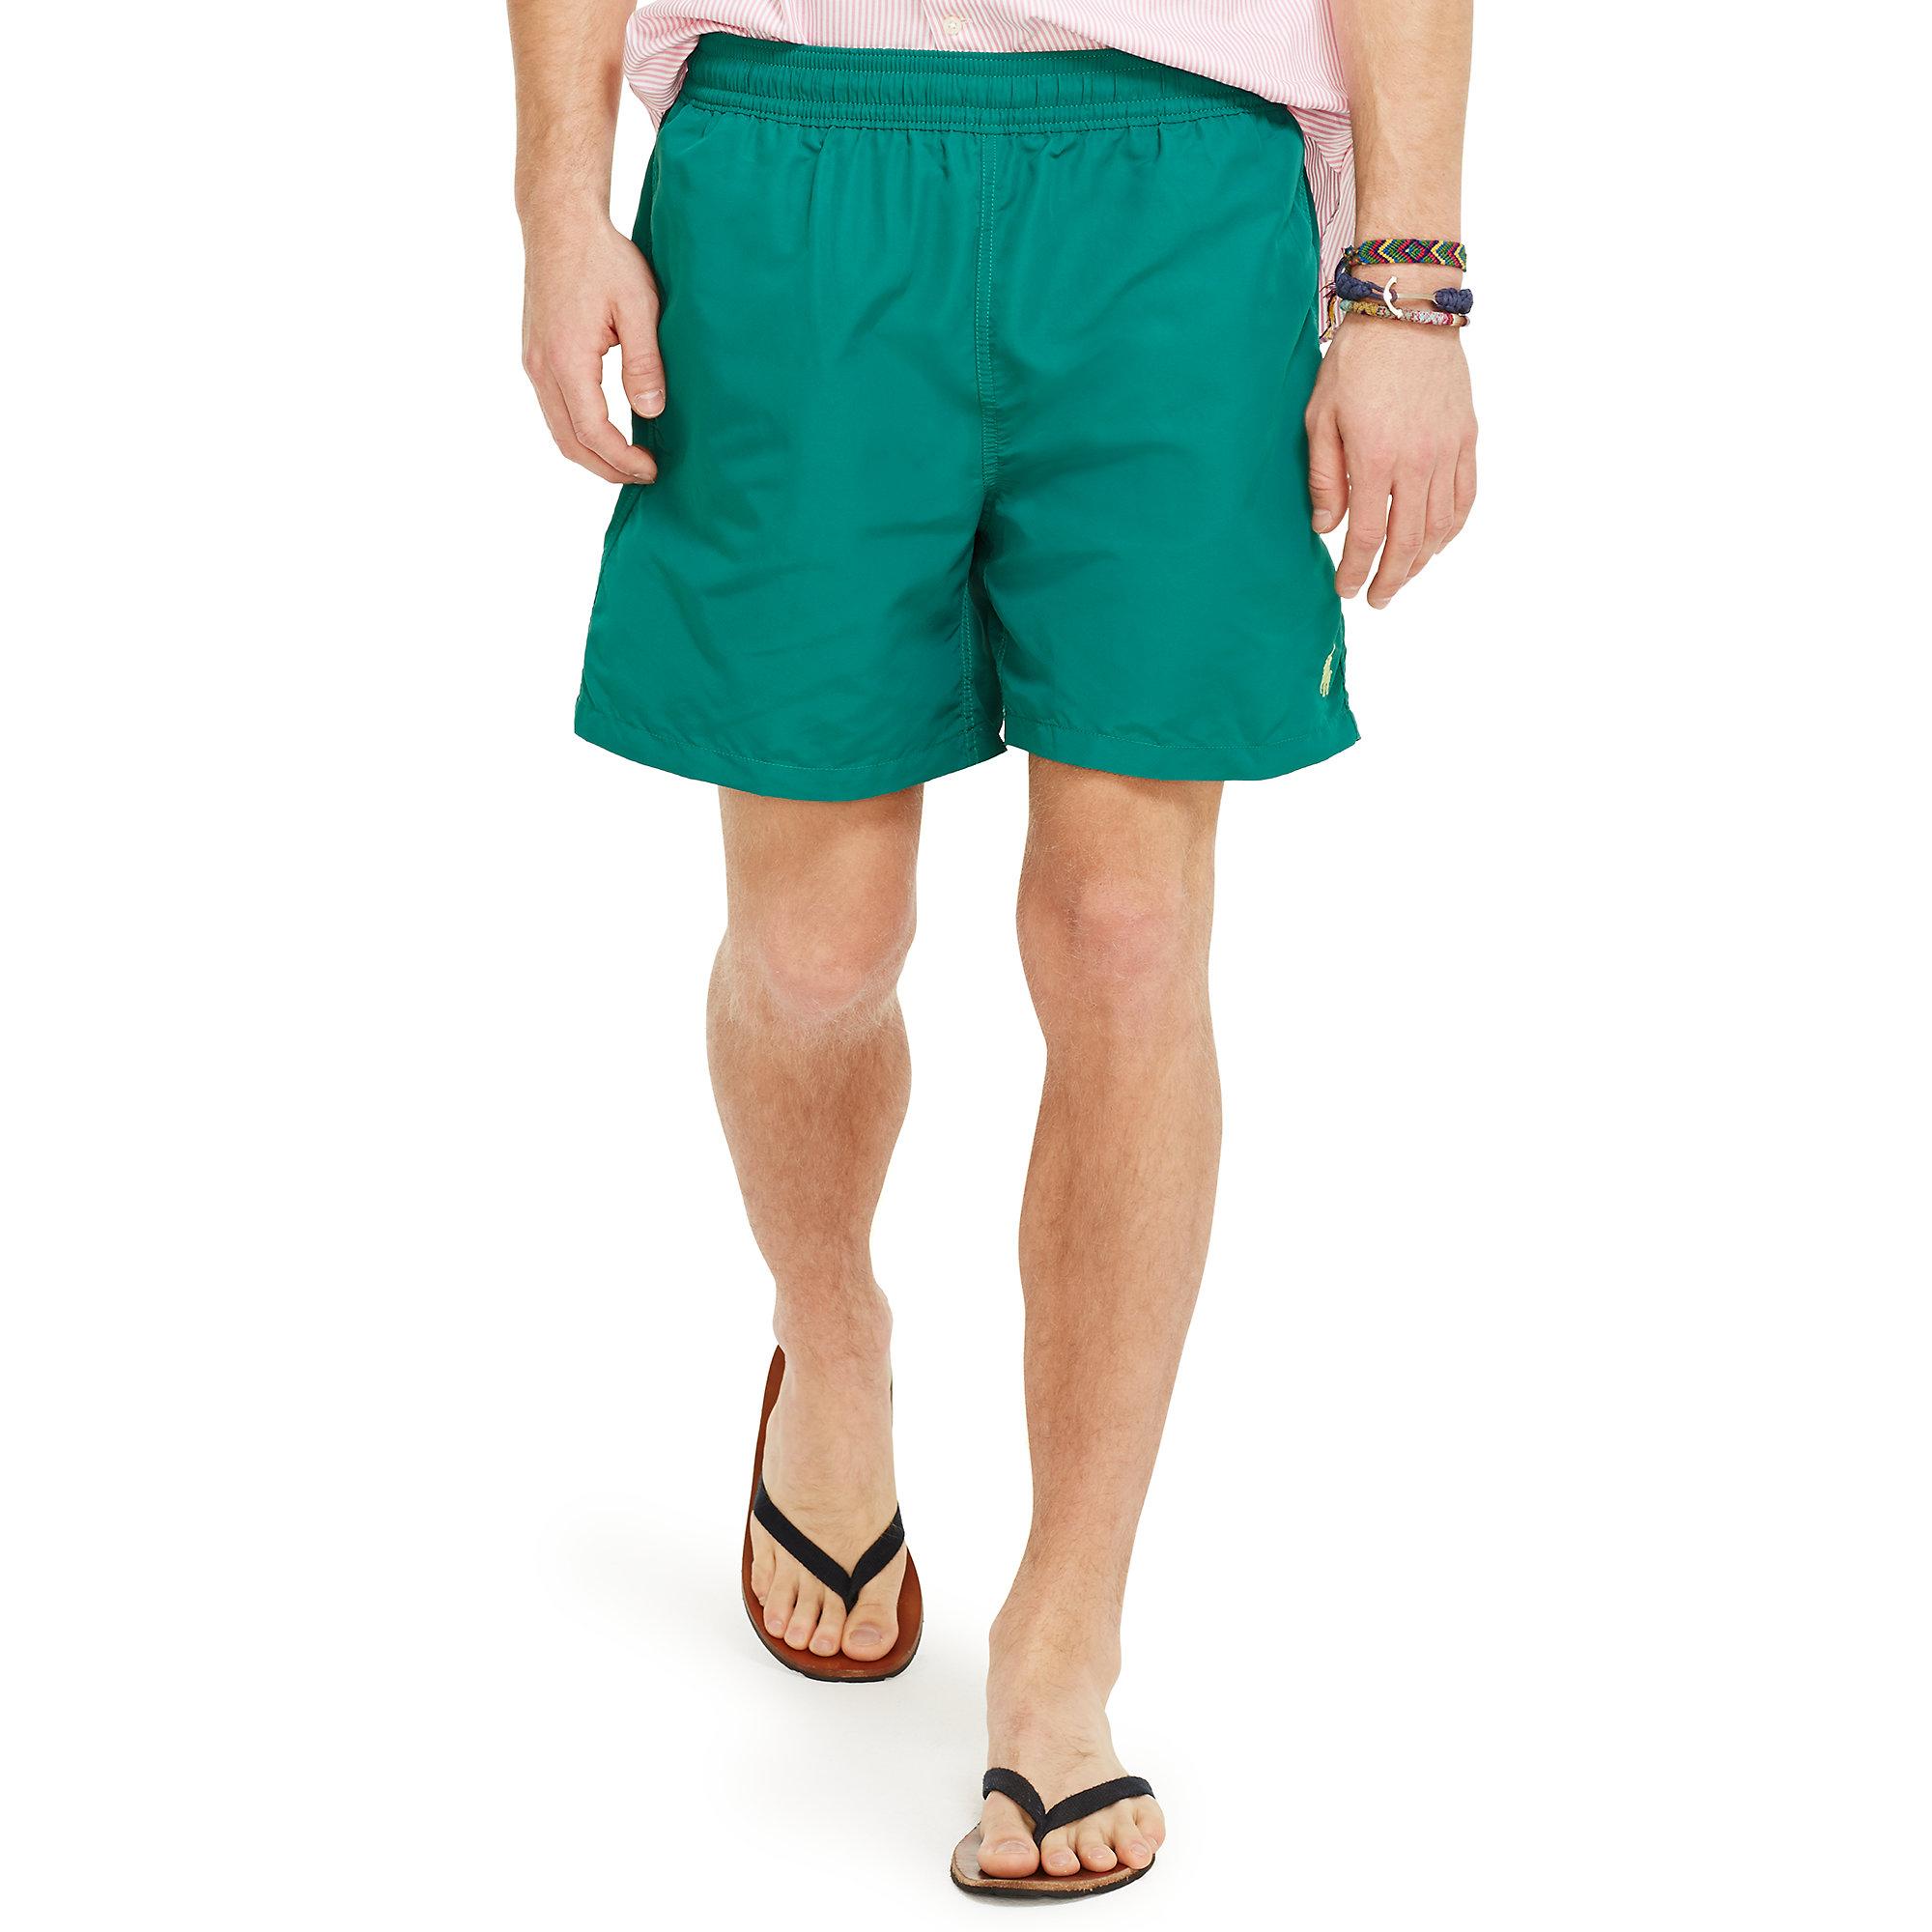 756c0f56a9c76 ... switzerland lyst polo ralph lauren 6 solid hawaiian swim trunk in green  for men 55d43 62789